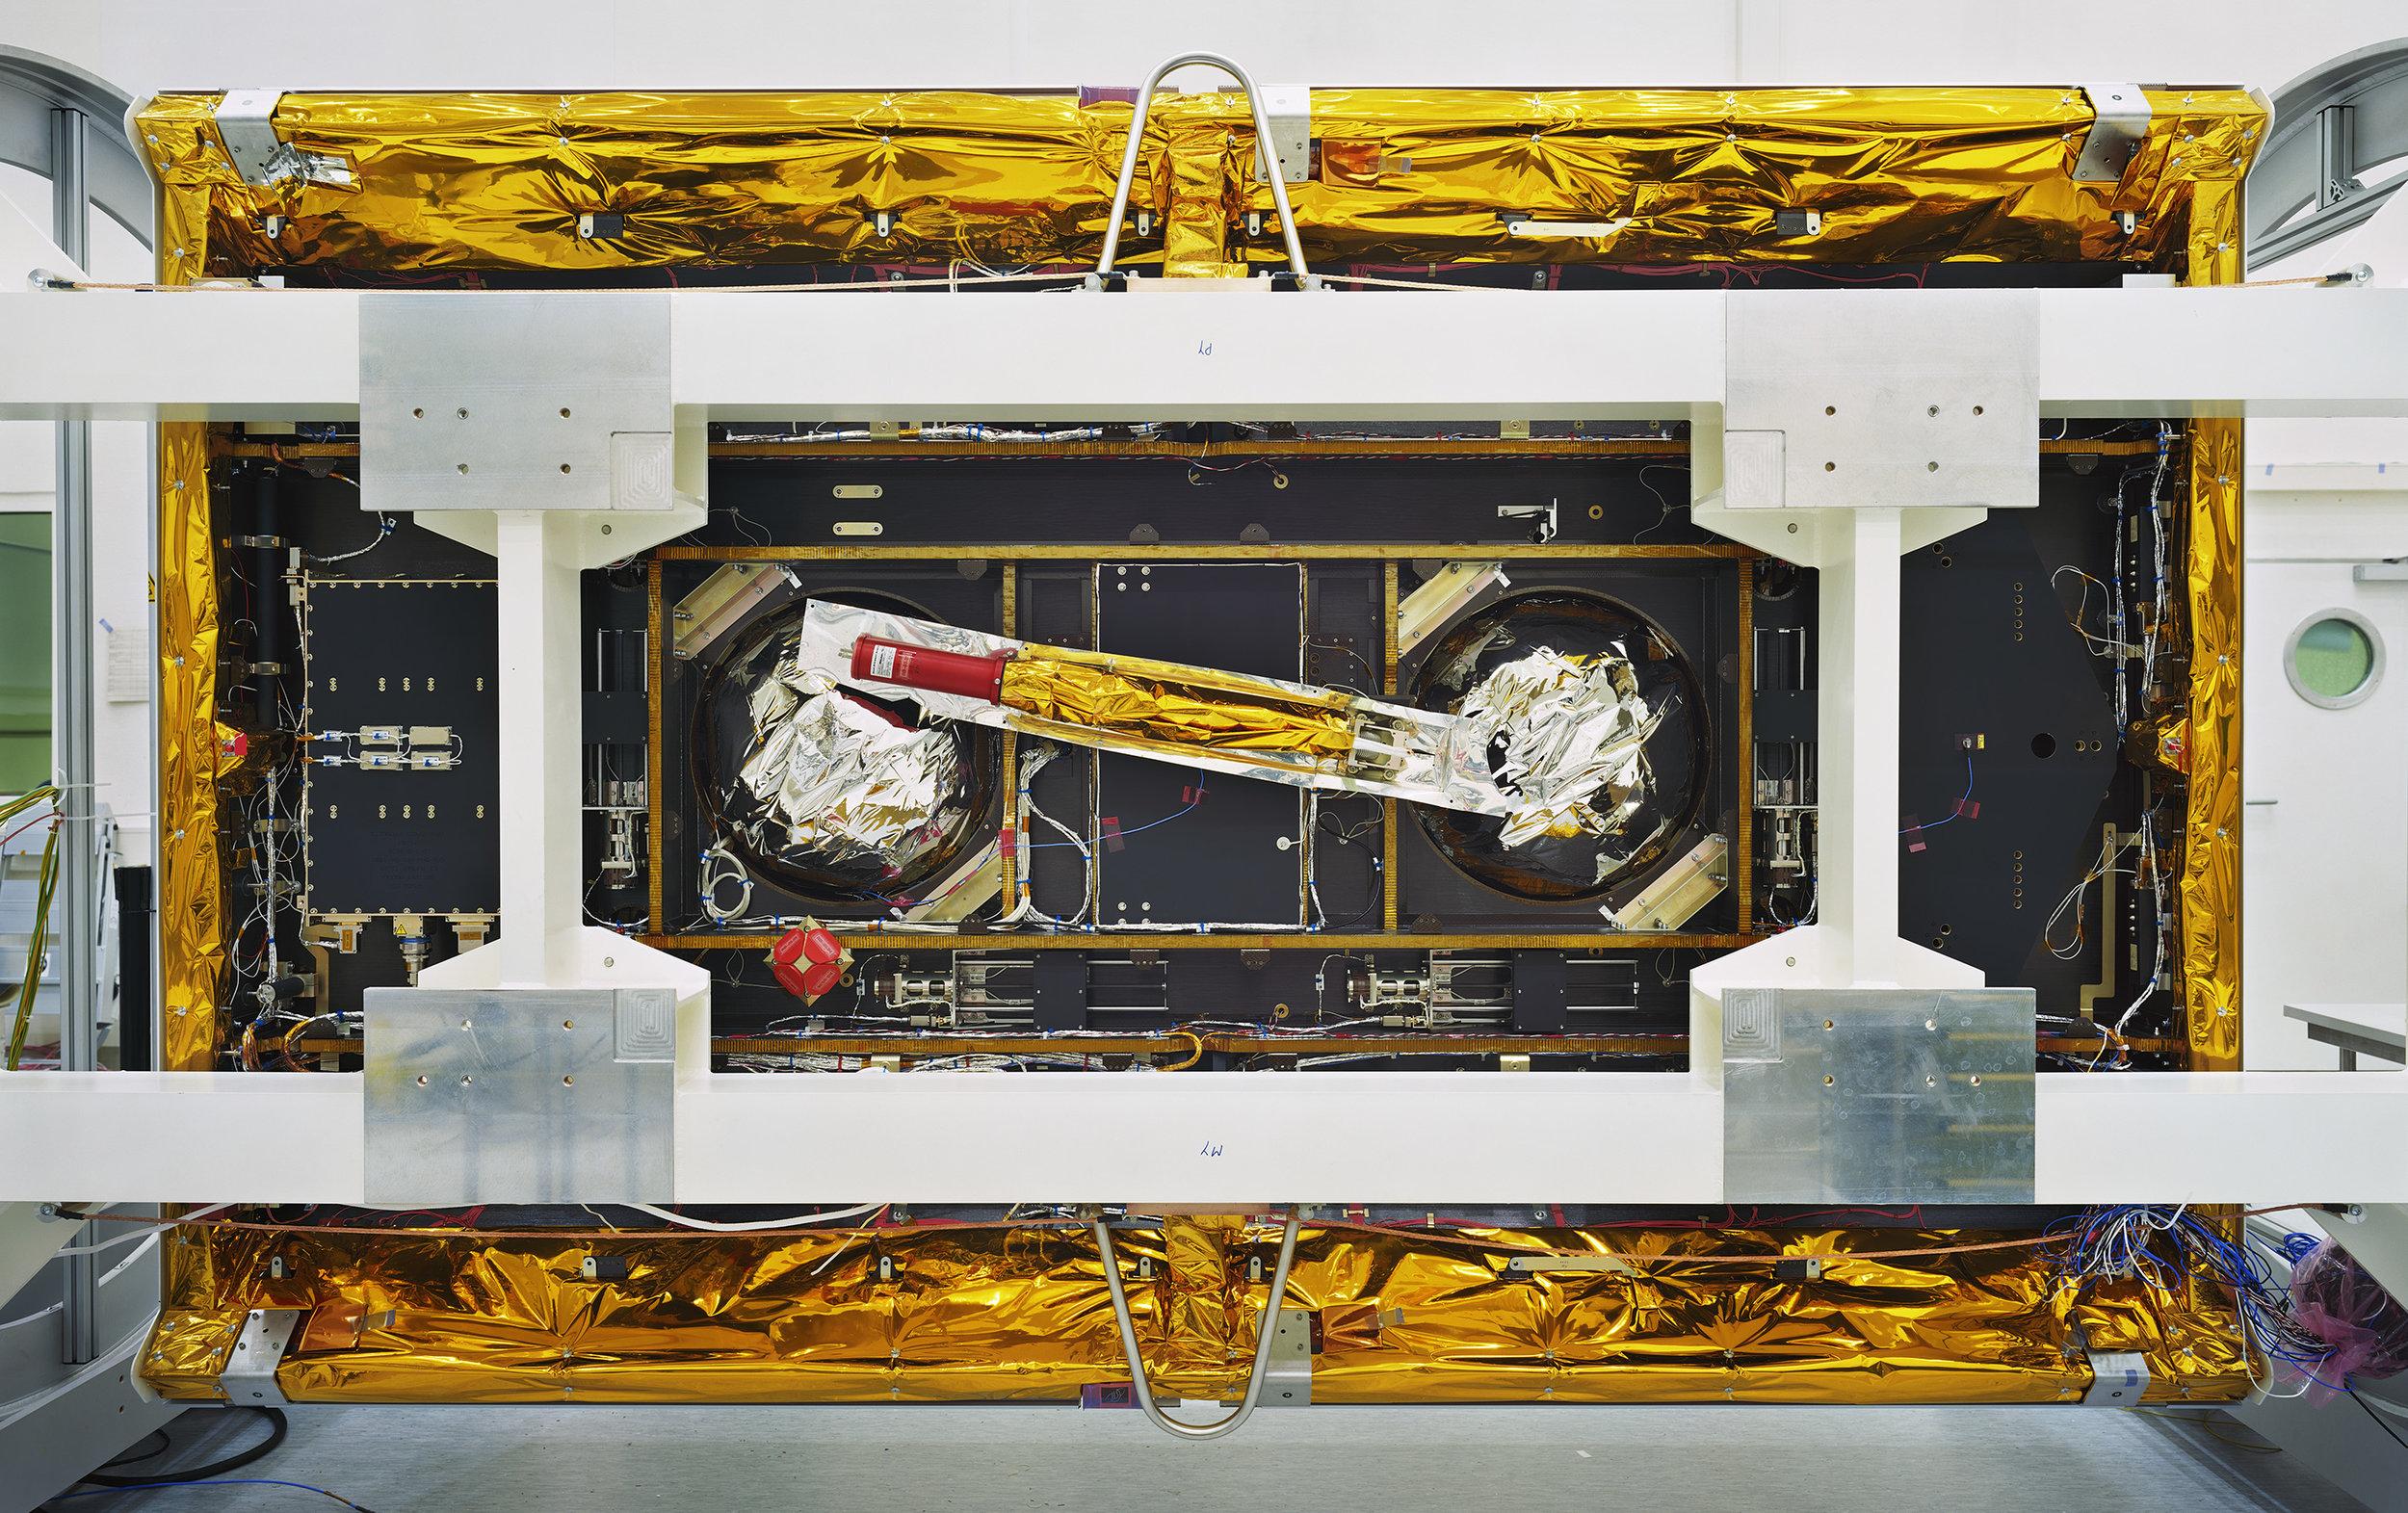 THOMAS STRUTH GRACE-Follow-On Bottom View, IABG, Ottobrunn, 2017 Inkjet print Image: 53 1/8 x 84 5/8 in. (135 x 214.8 cm) Frame: 56 3/4 x 88 1/4 x 2 3/8 in. (144.1 x 224.2 x 6 cm) Edition of 6 (20445)